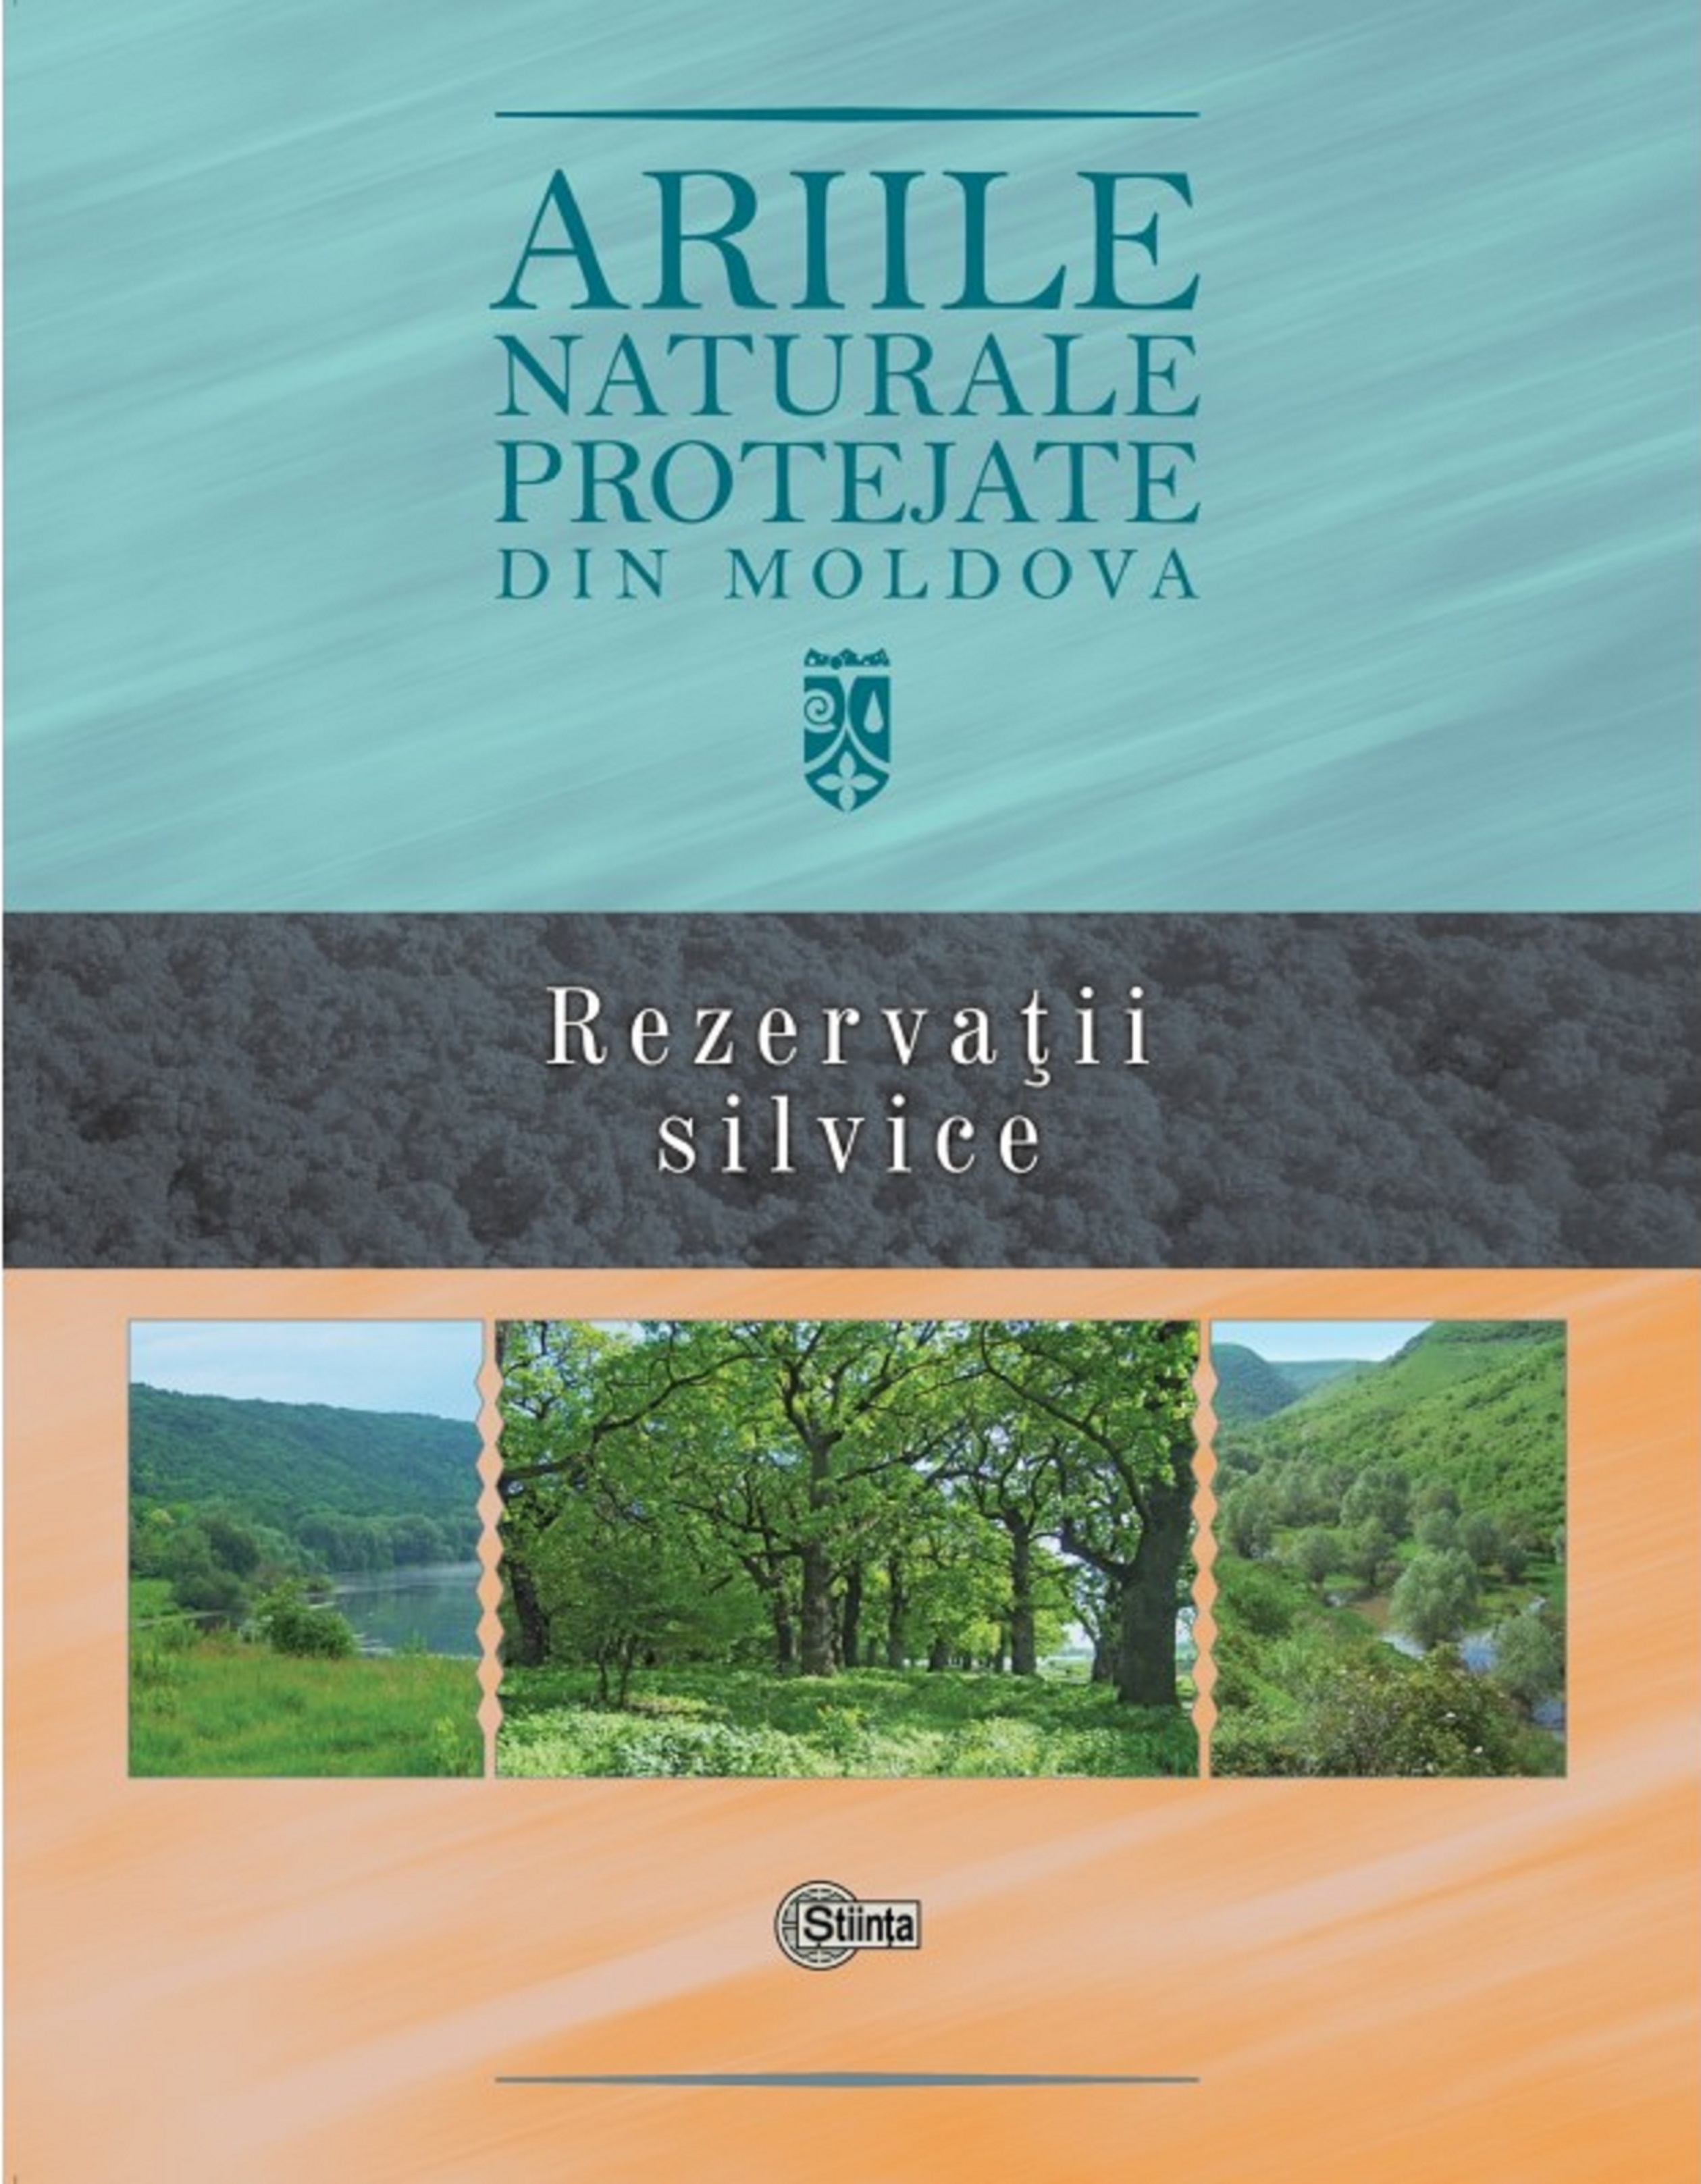 Ariile naturale protejate din Moldova. Vol 3.